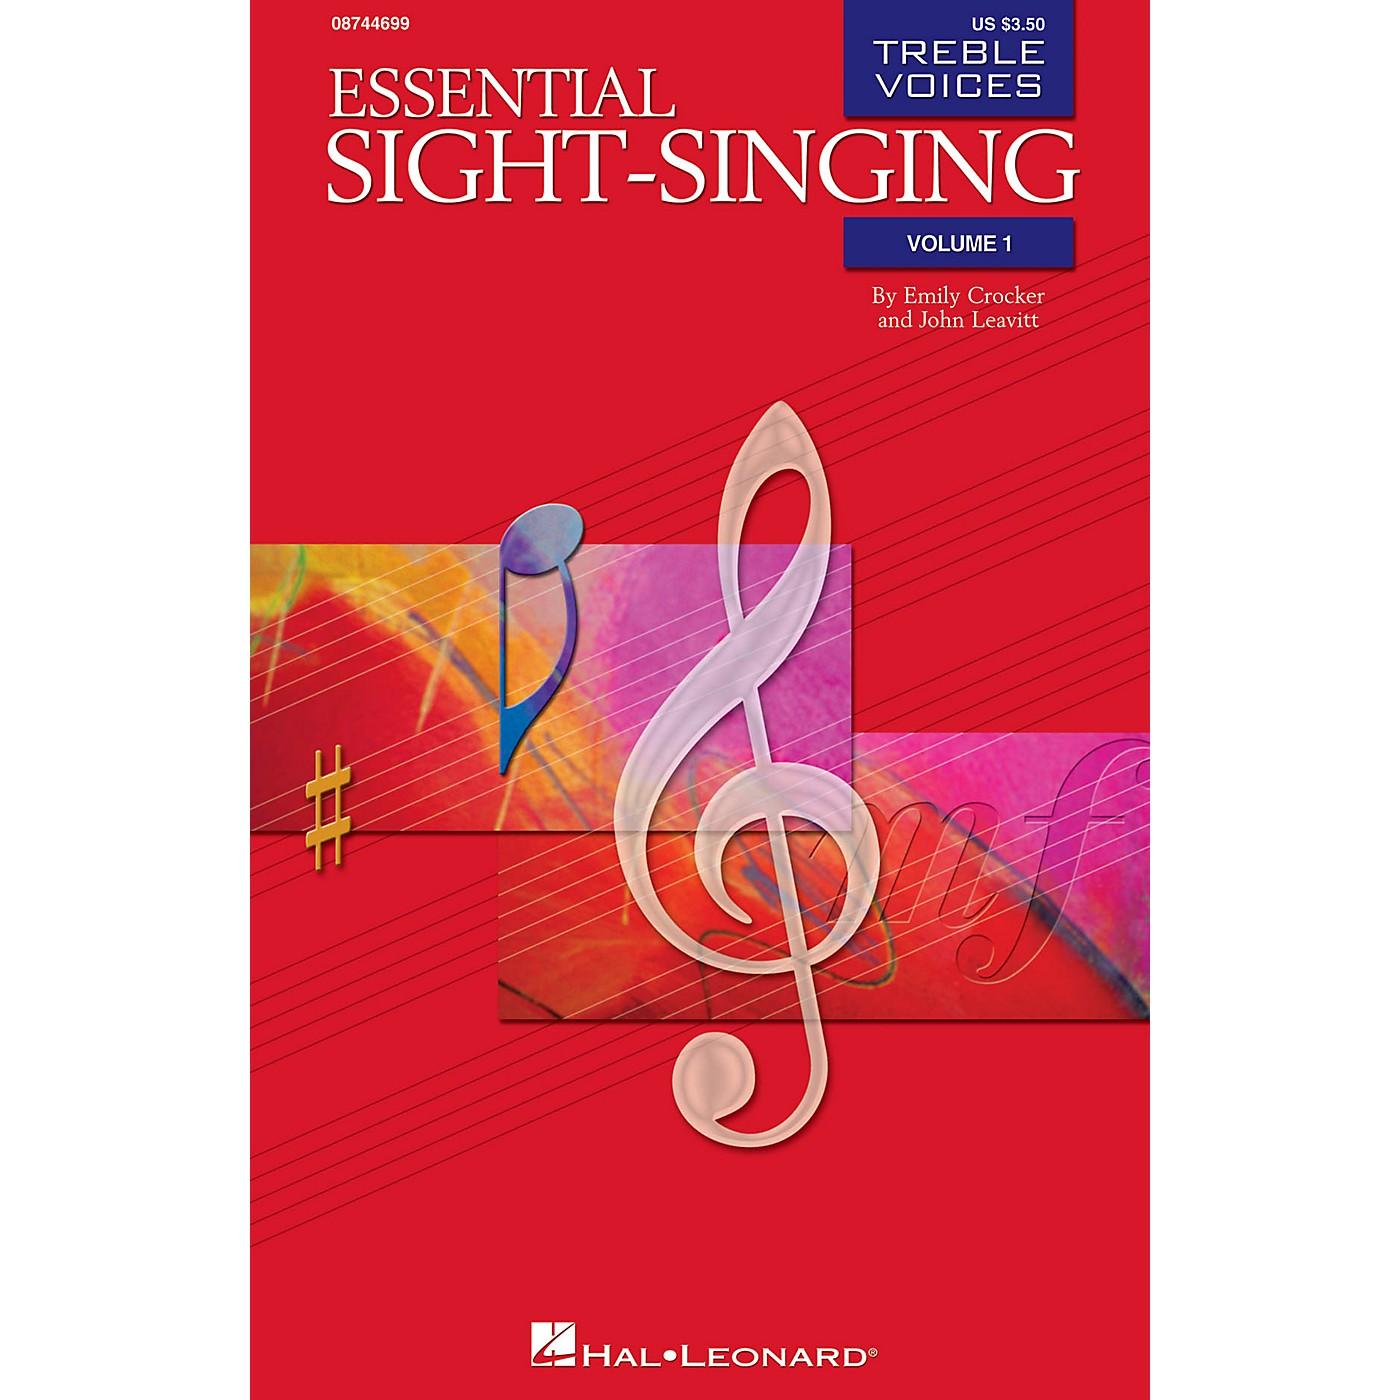 Hal Leonard Essential Sight-Singing Vol. 1 Treble Voices (Treble Voices Accompaniment CD Volume 1) CD ACCOMP thumbnail